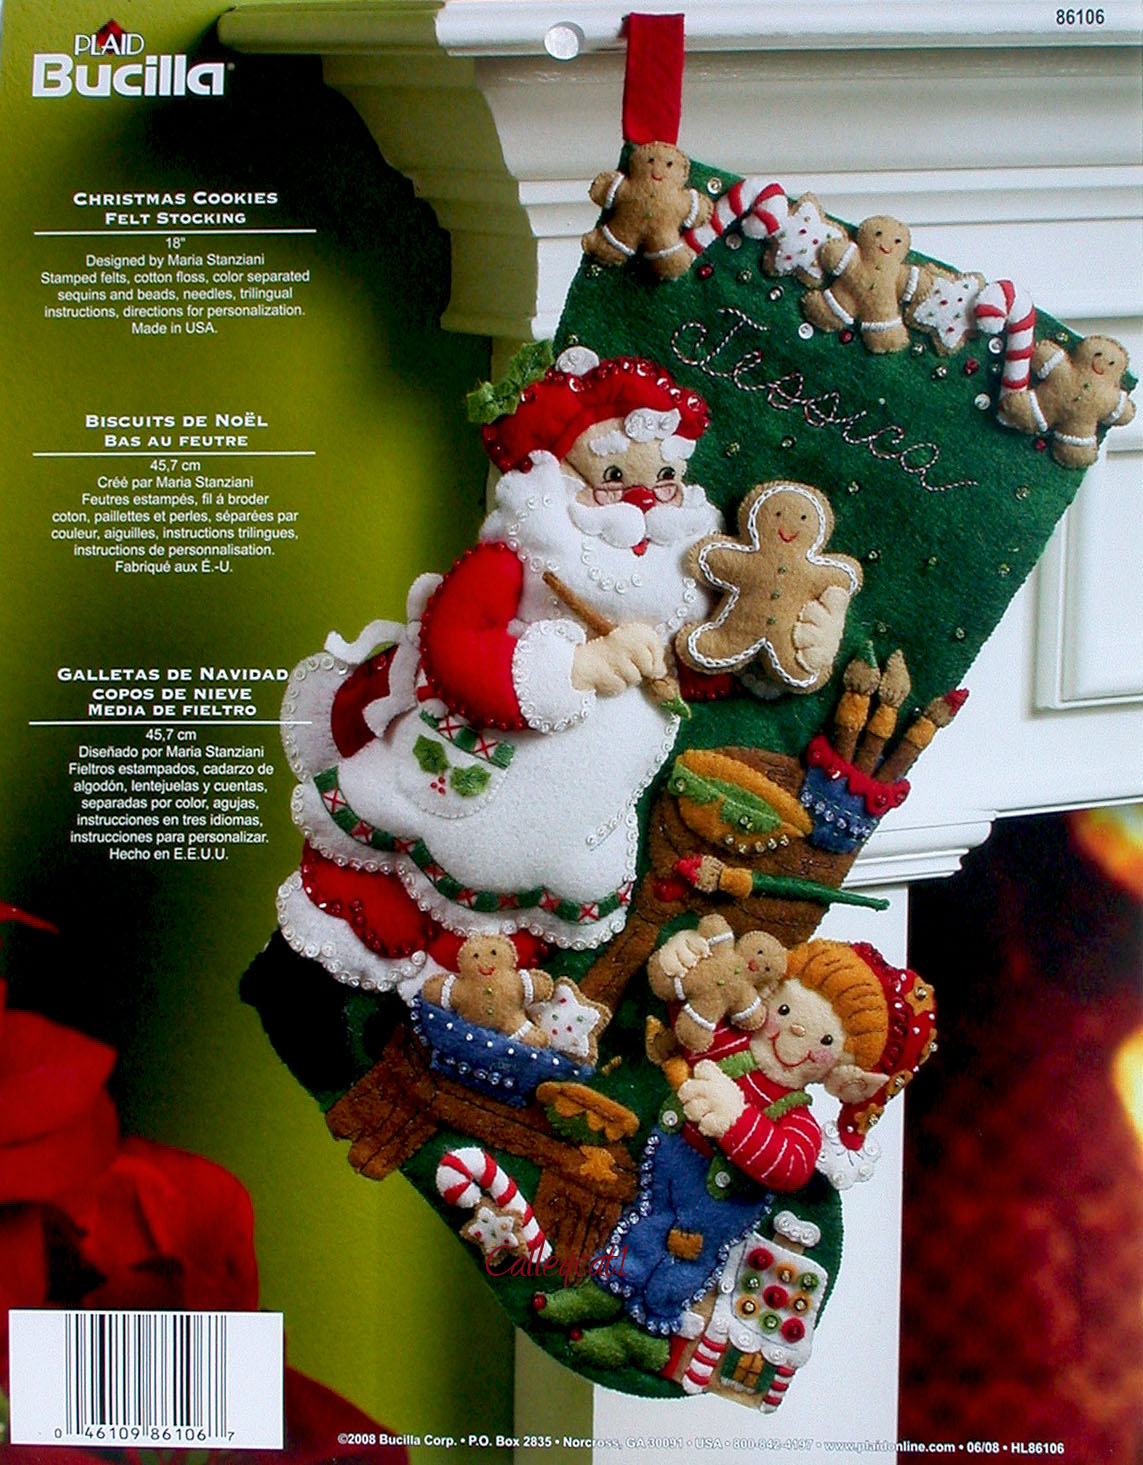 Christmas Cookies 18 Bucilla Felt Christmas Stocking Kit 86106